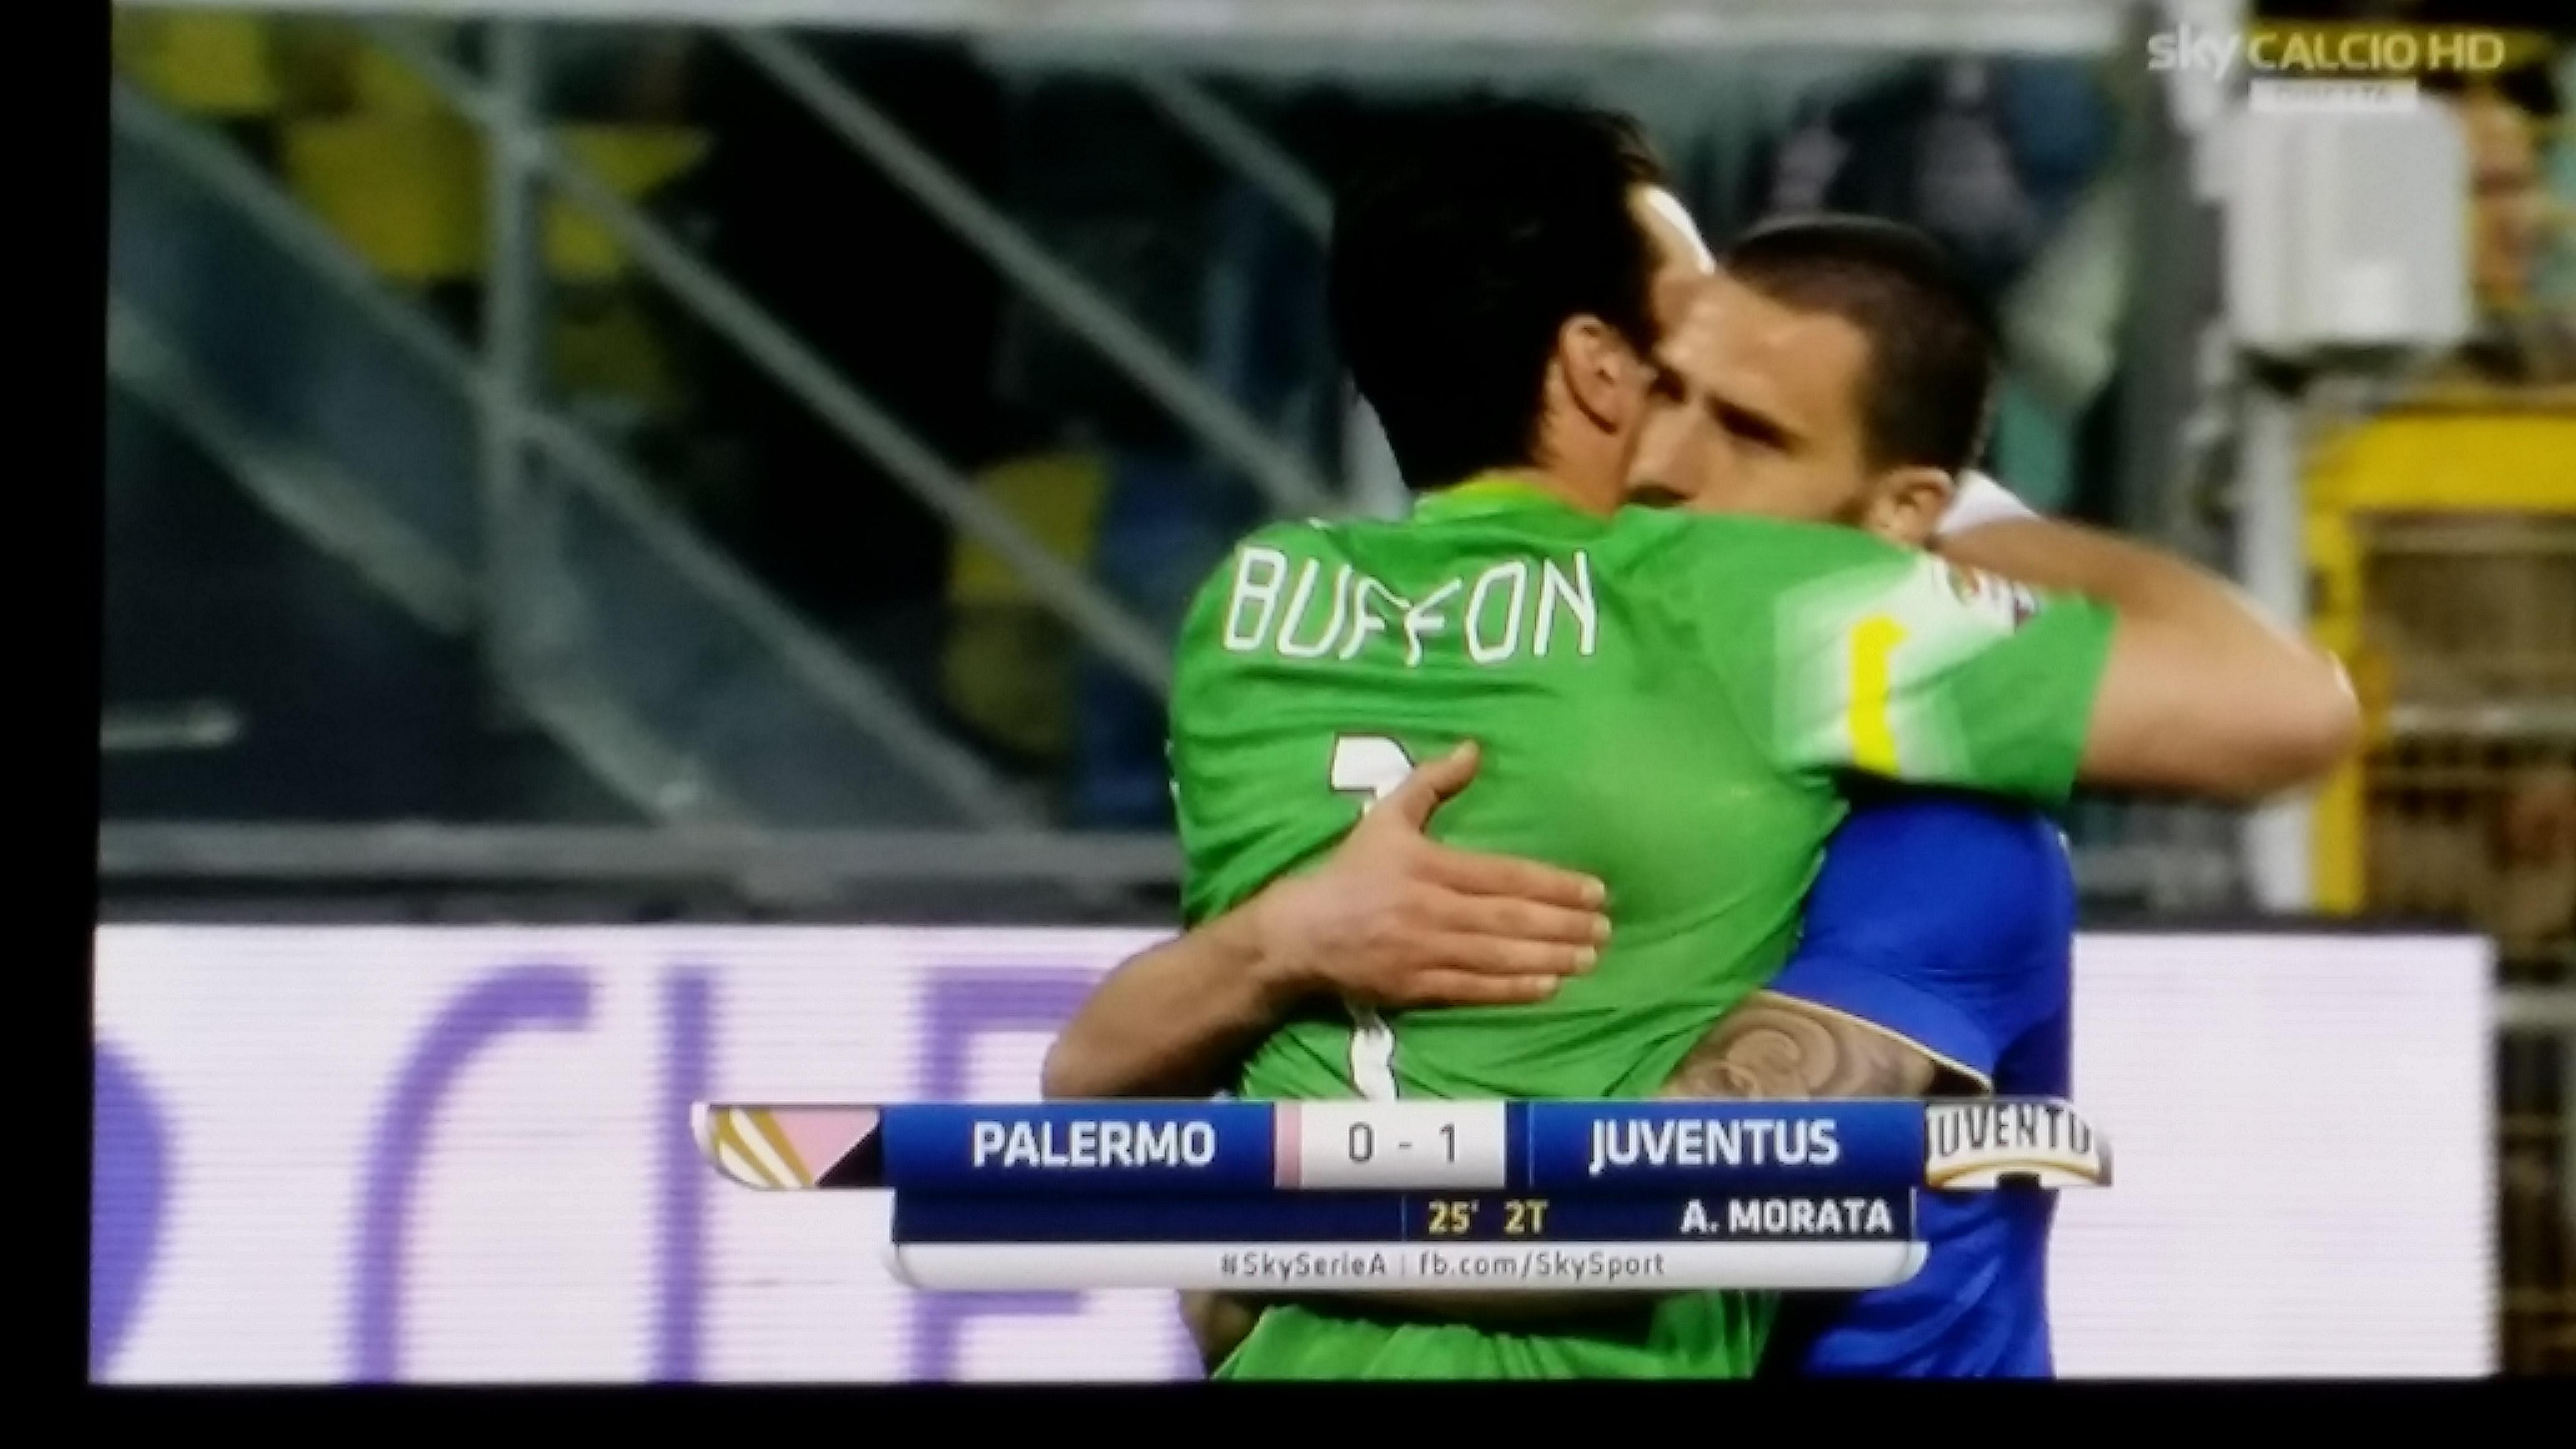 Palermo, fallisce l'impresa. Morata fa volare la Juve